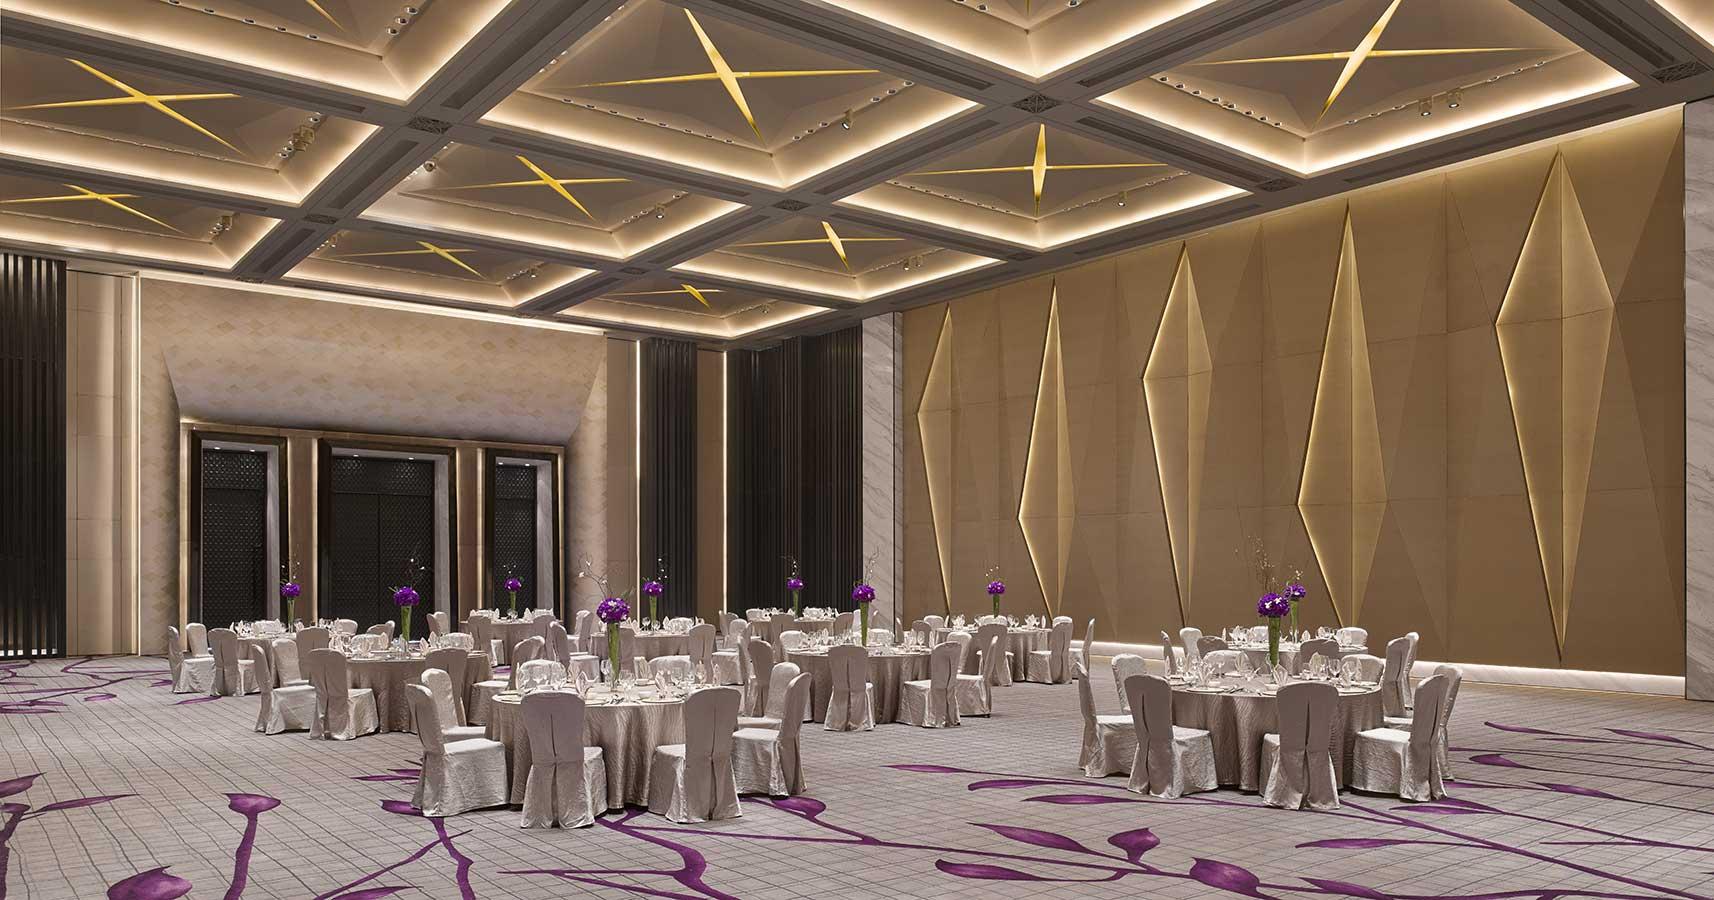 JW Marriott Baoan Hotels and Hospitality  Light Abilities